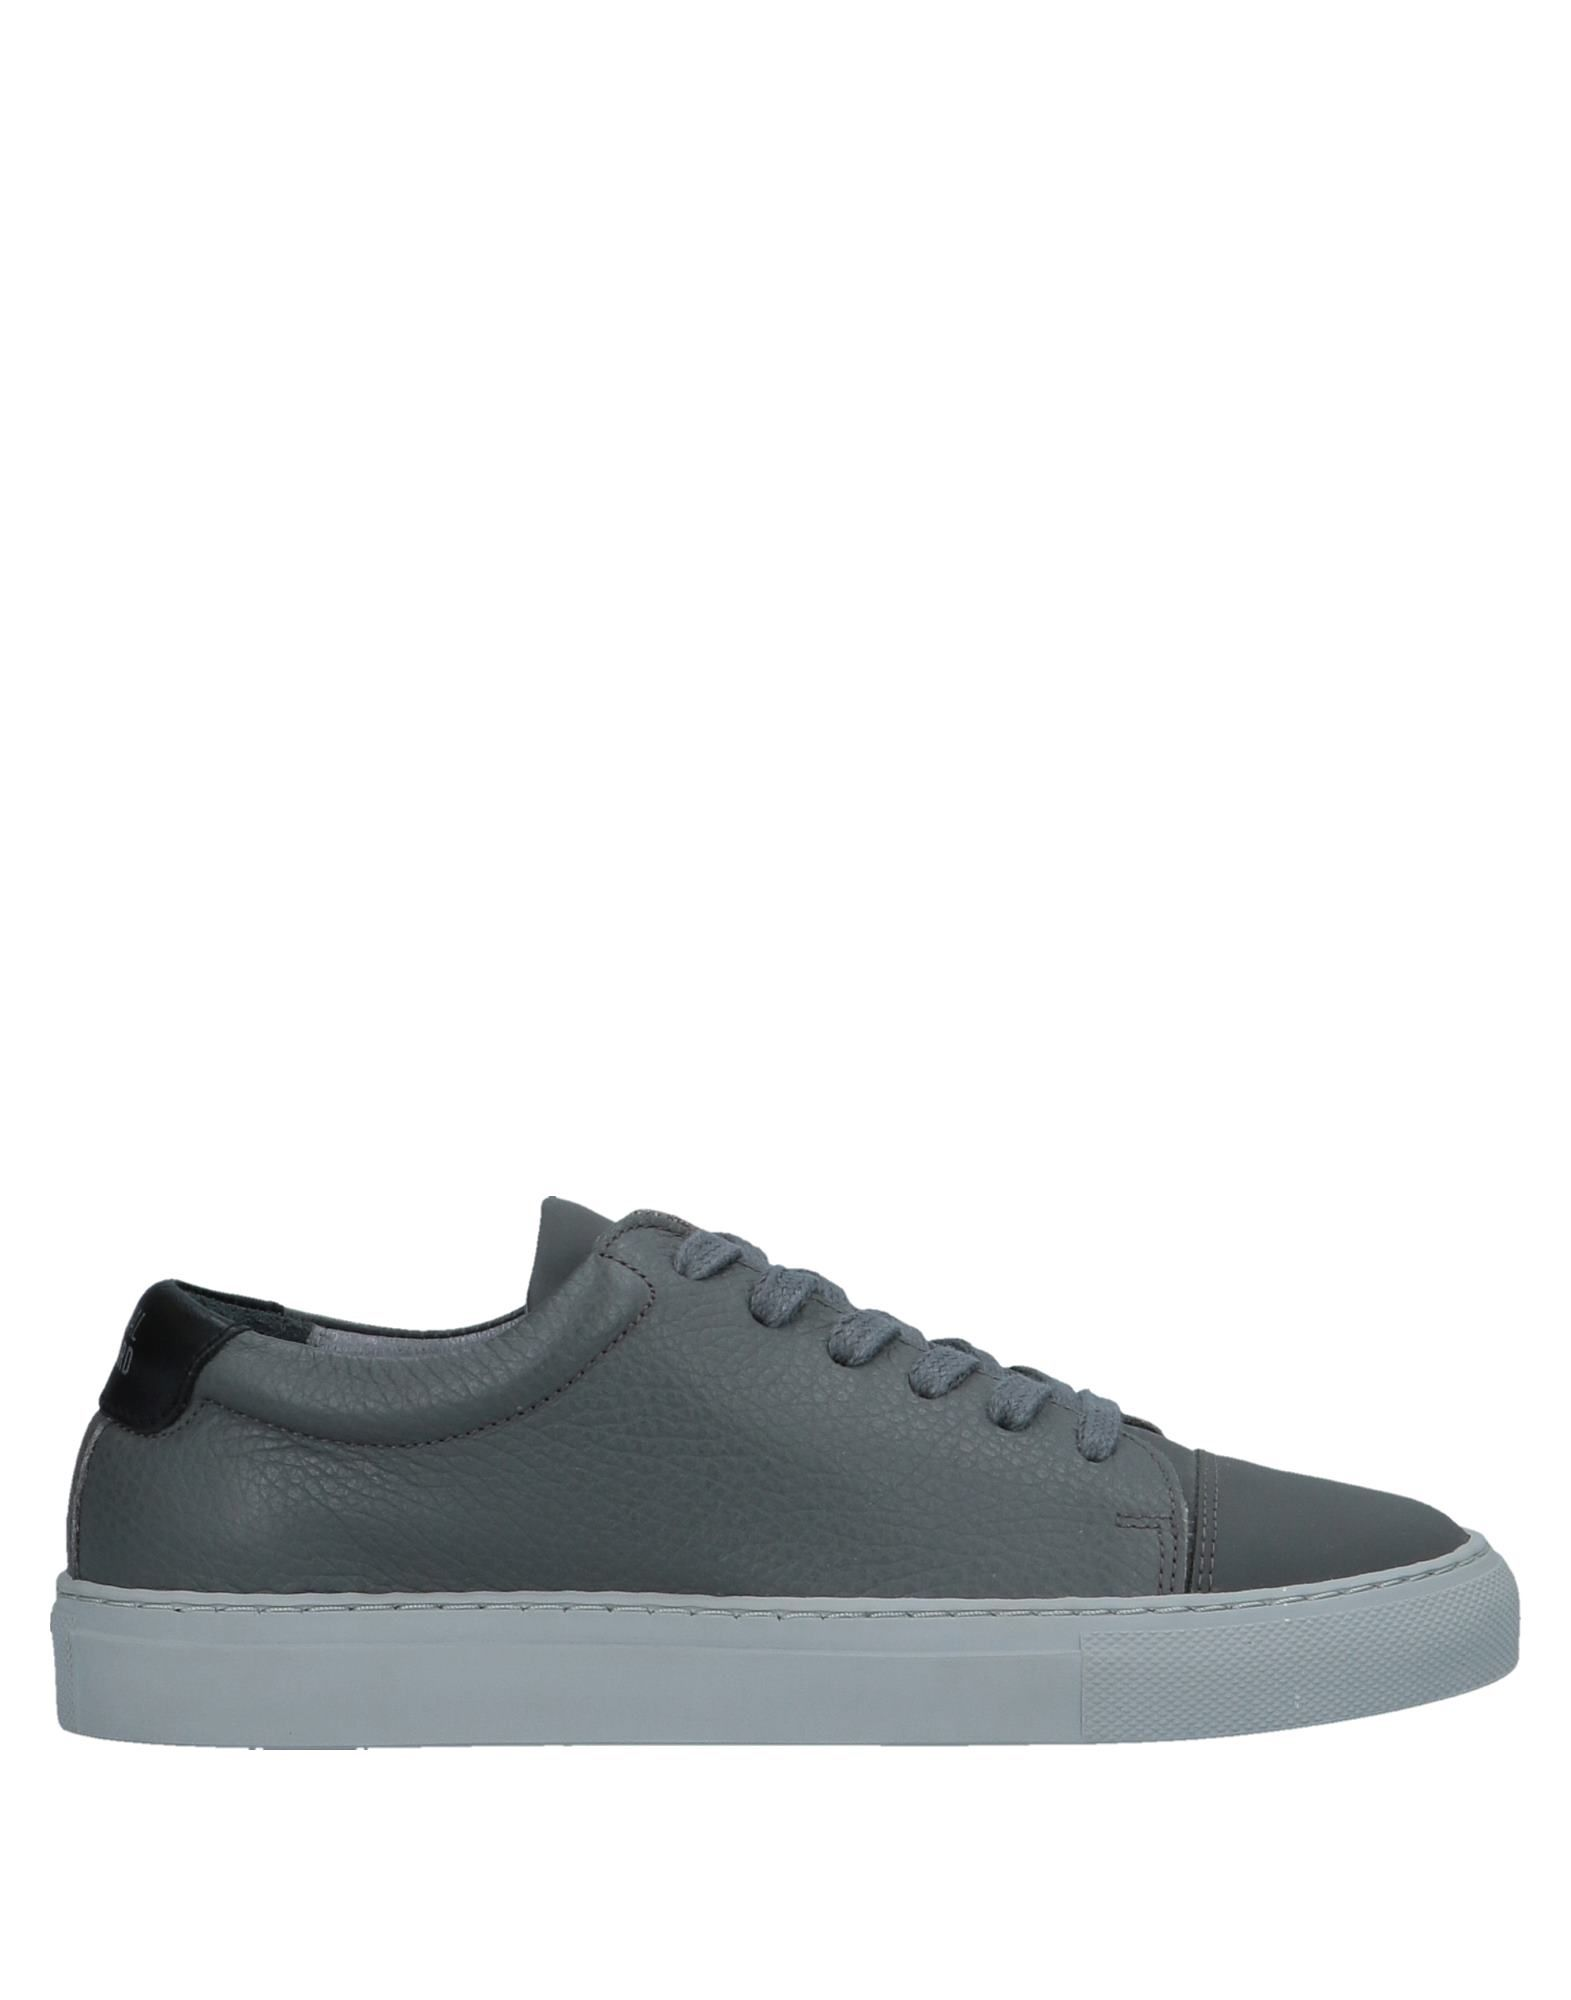 Stilvolle billige Schuhe National Standard Sneakers Damen  11539486CR